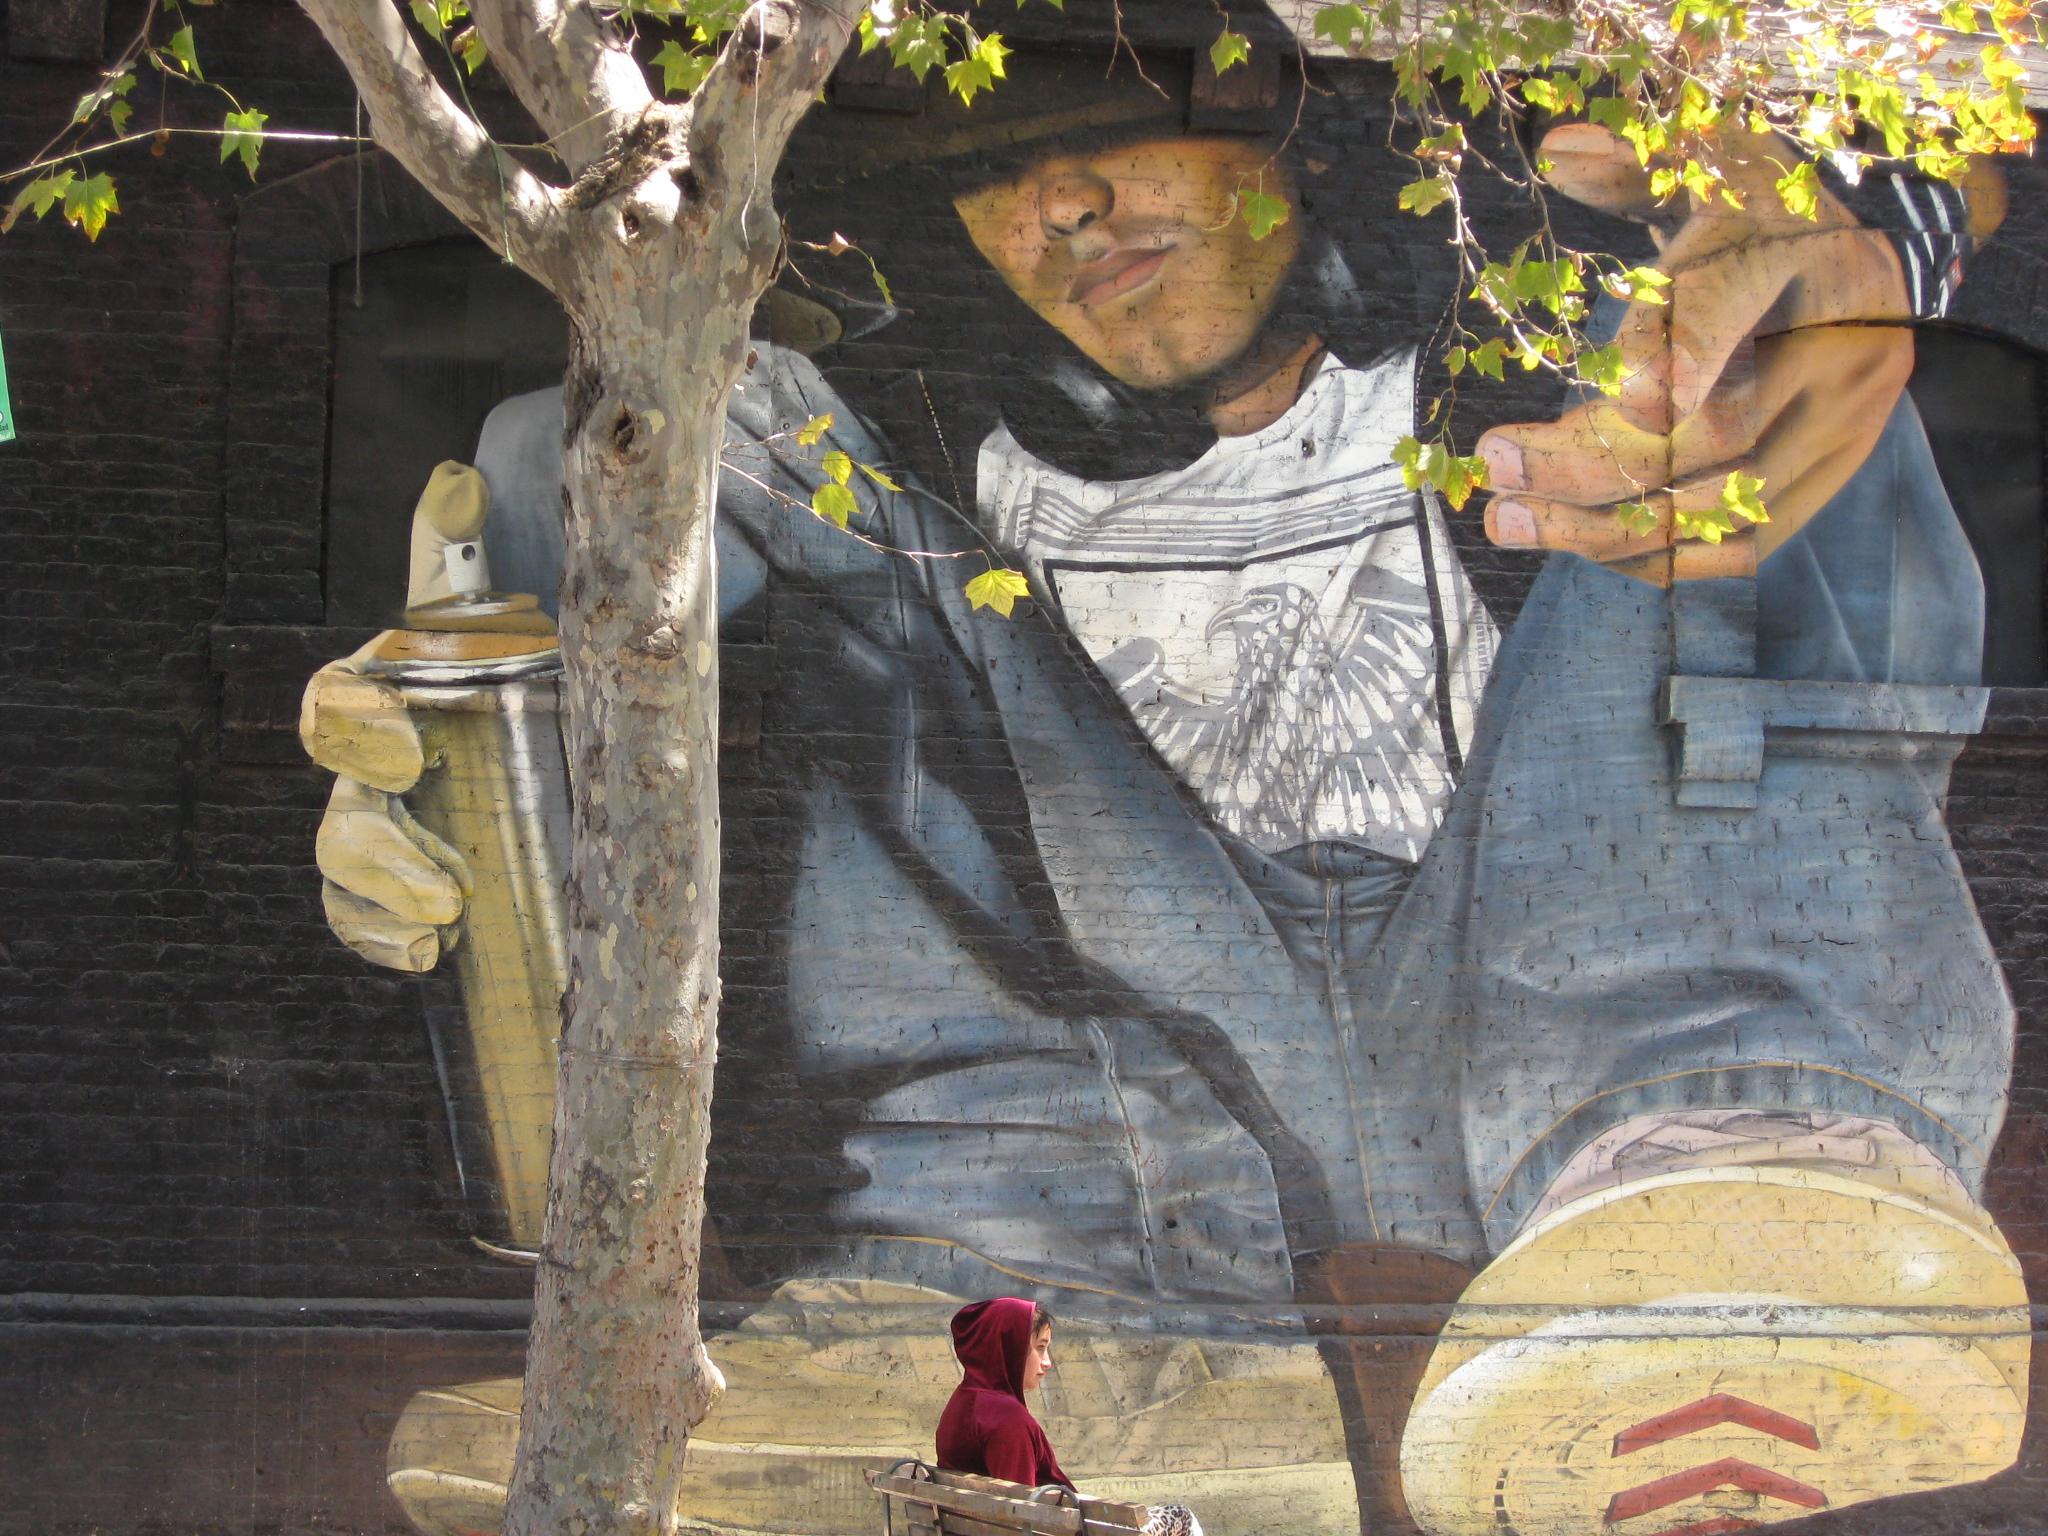 Street art in Barrio Bellavista